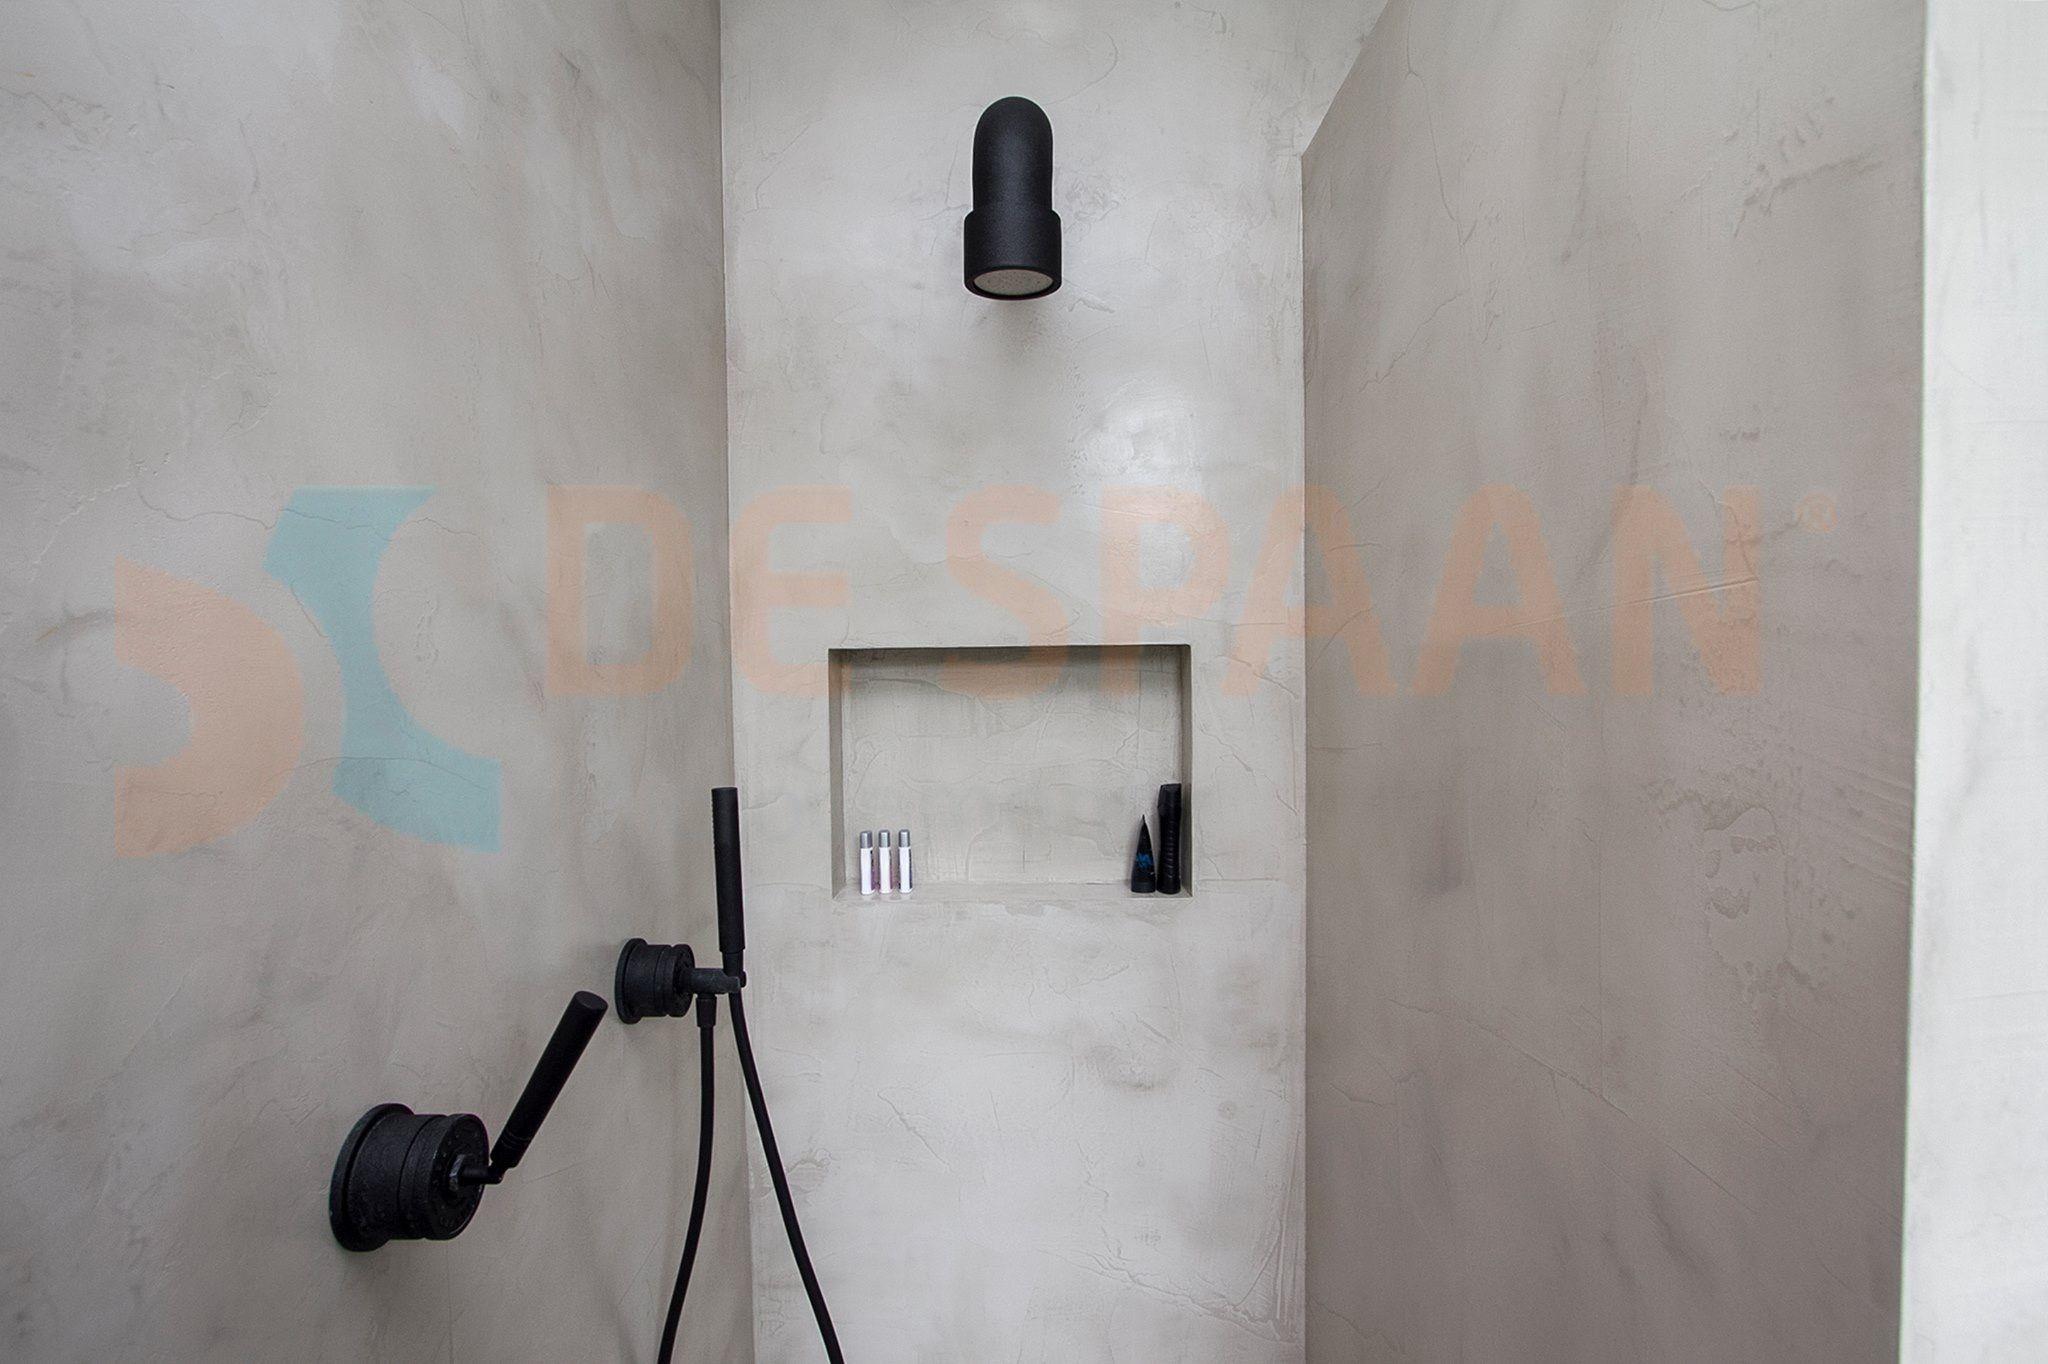 Badkamer Stucwerk Waterdicht : Betonlook? waterdicht stucwerk in badkamers? kies voor microcement